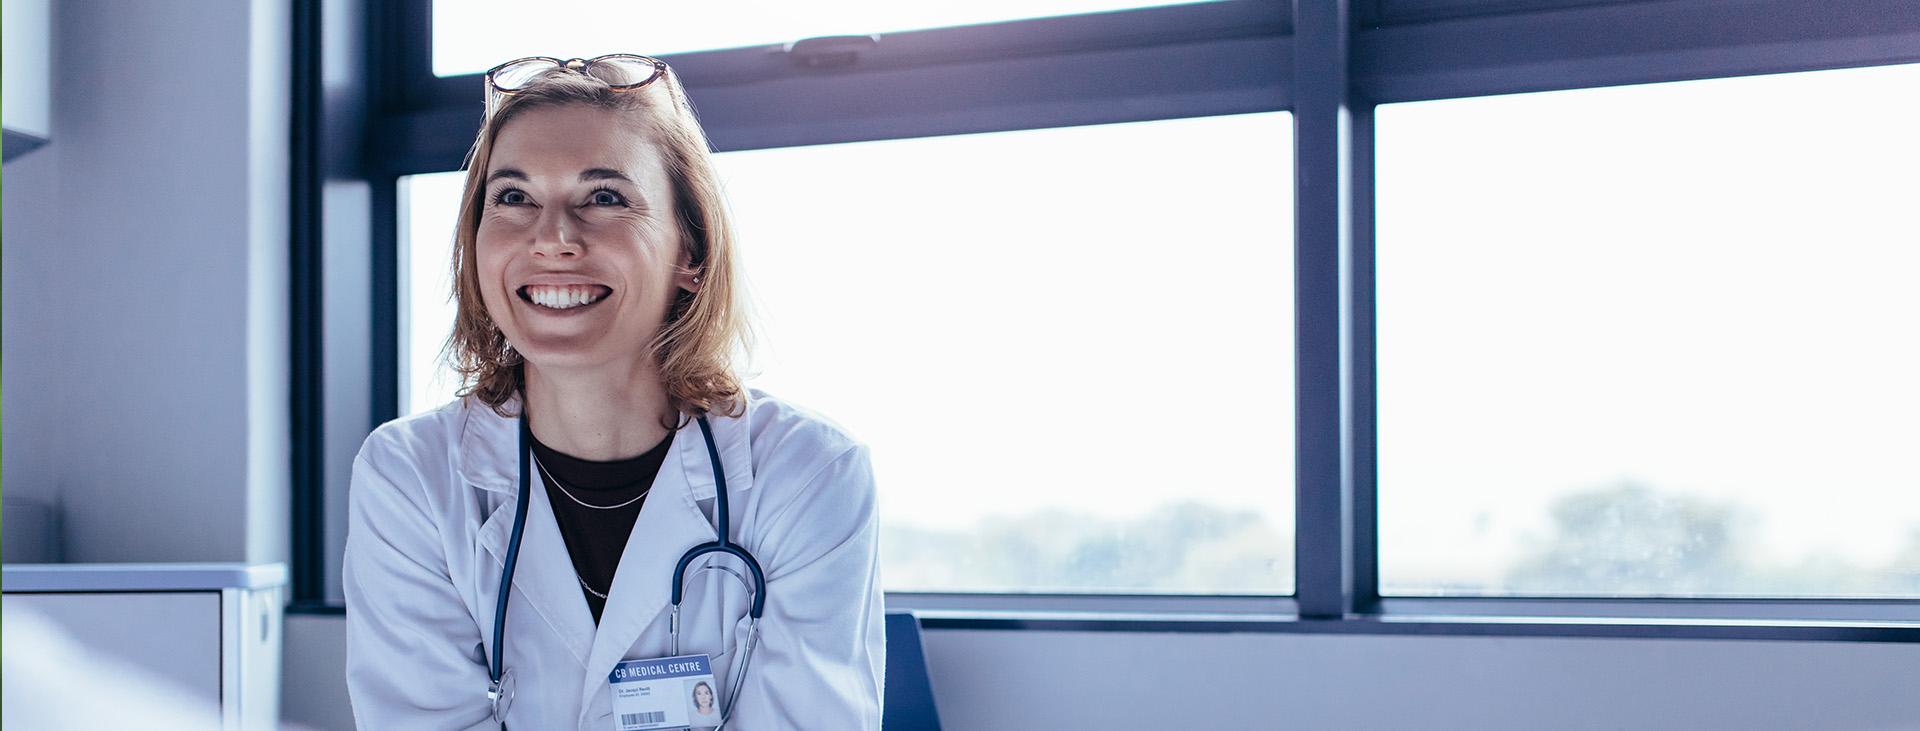 FAQs for Colorado Volunteer Physicians